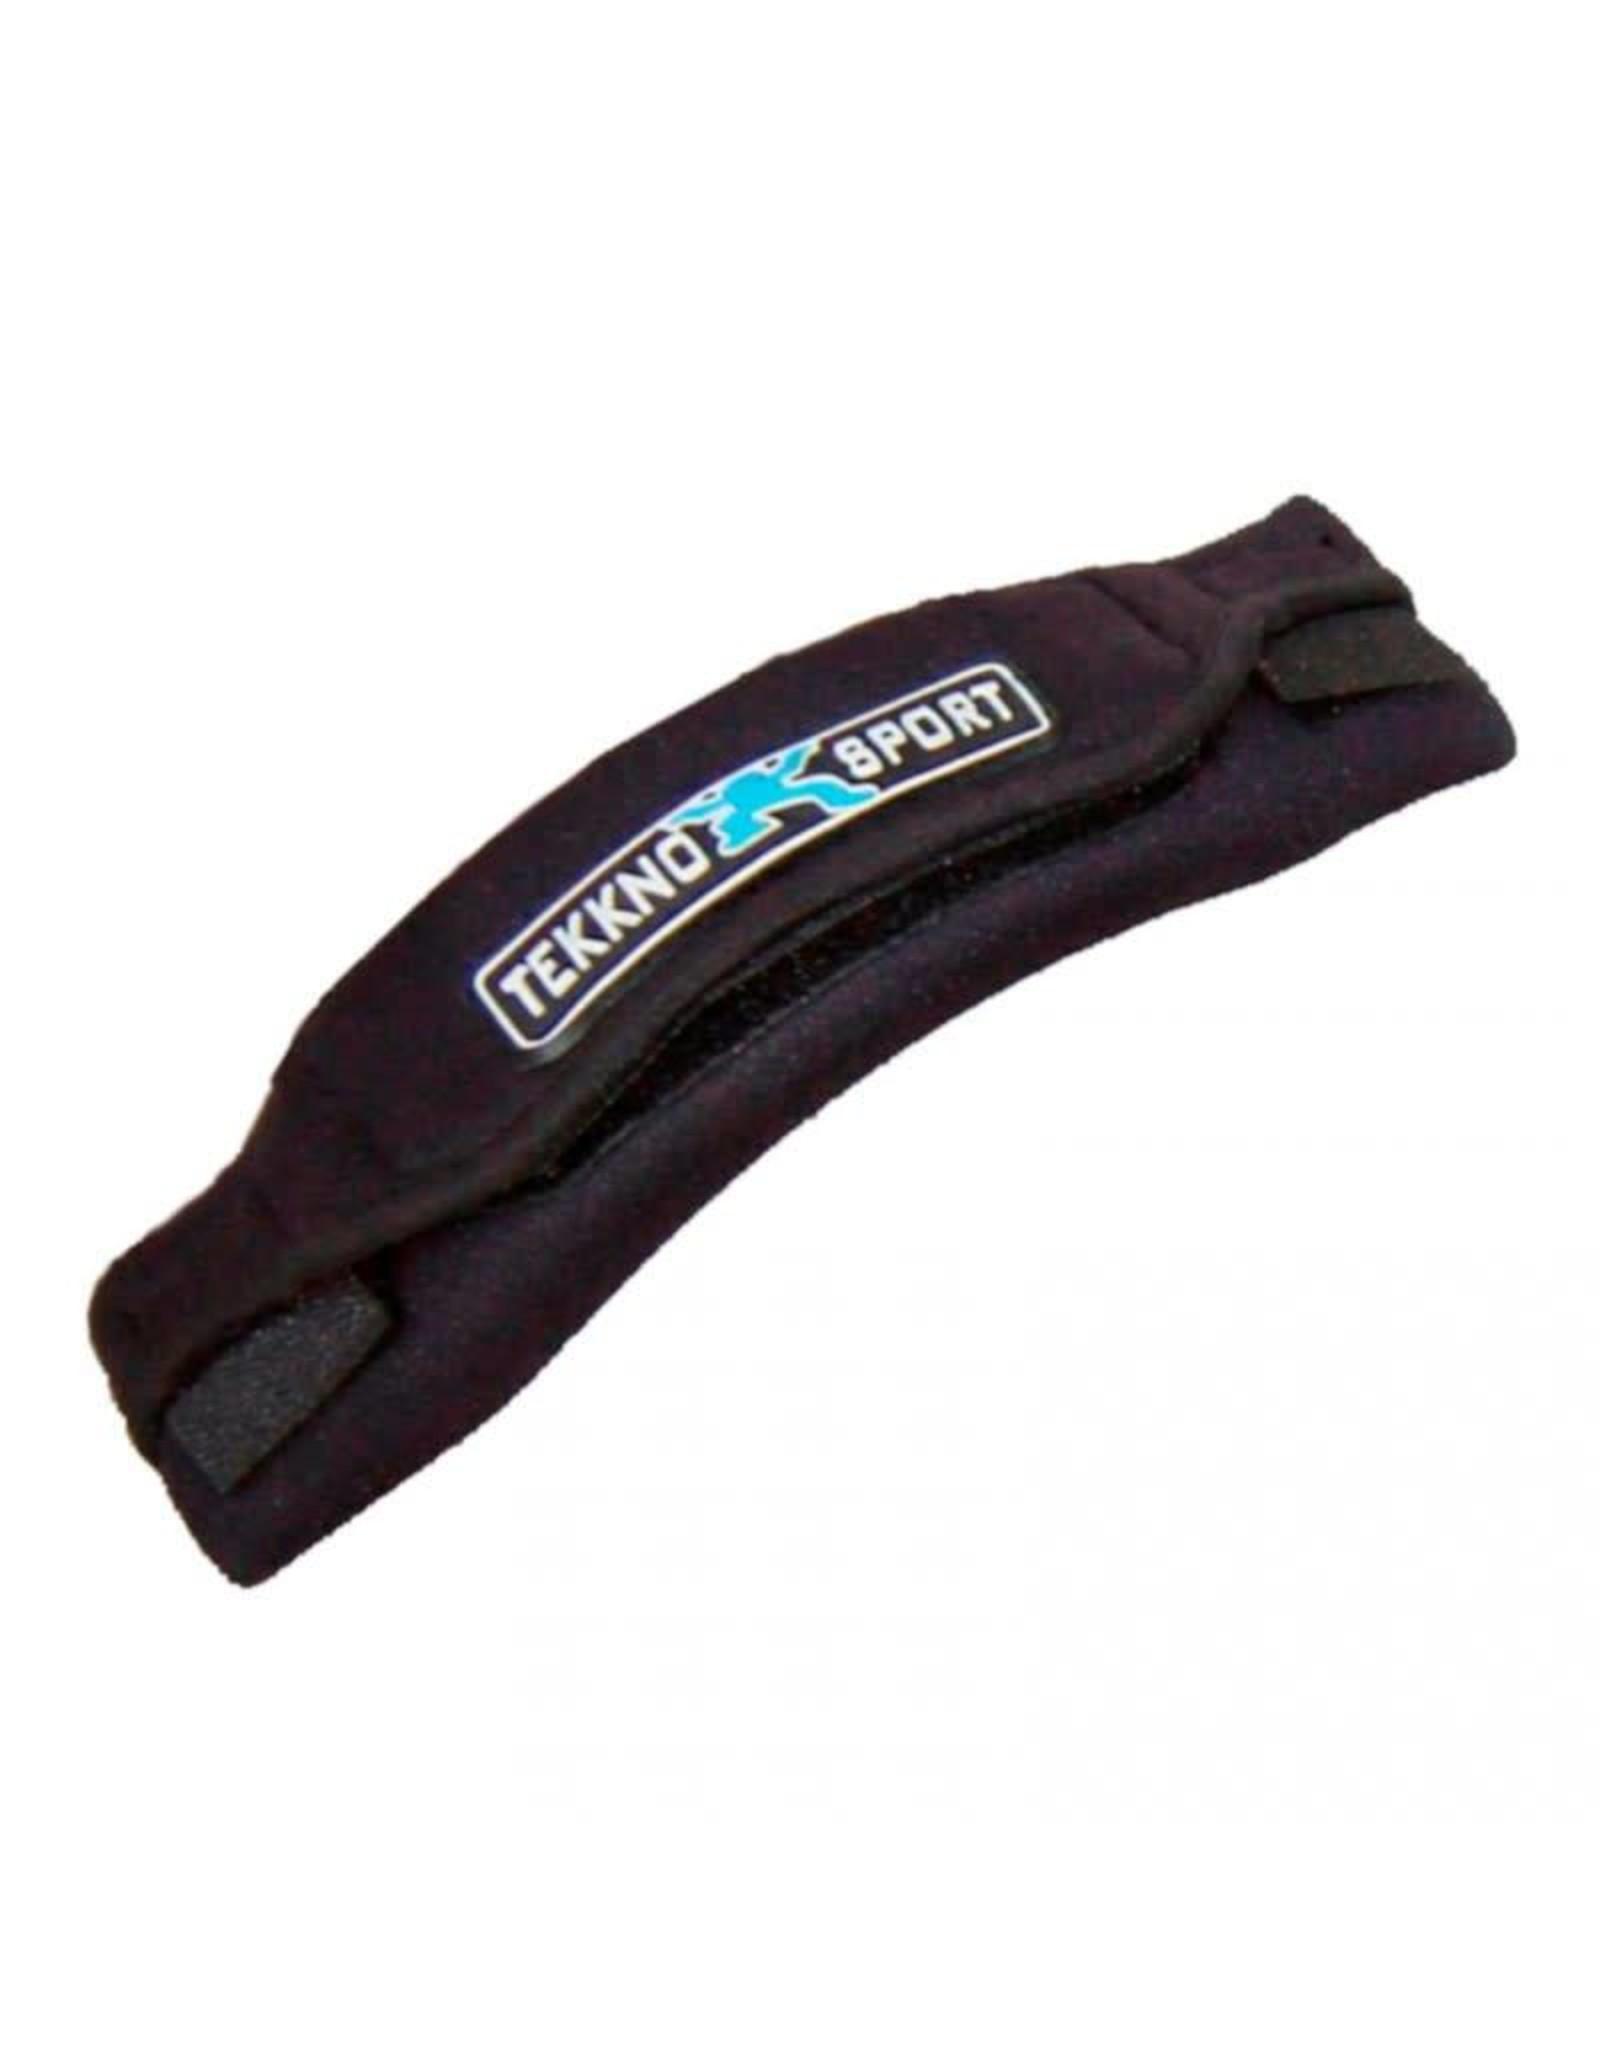 Tekknosport Tekknosport Footstrap Strong X